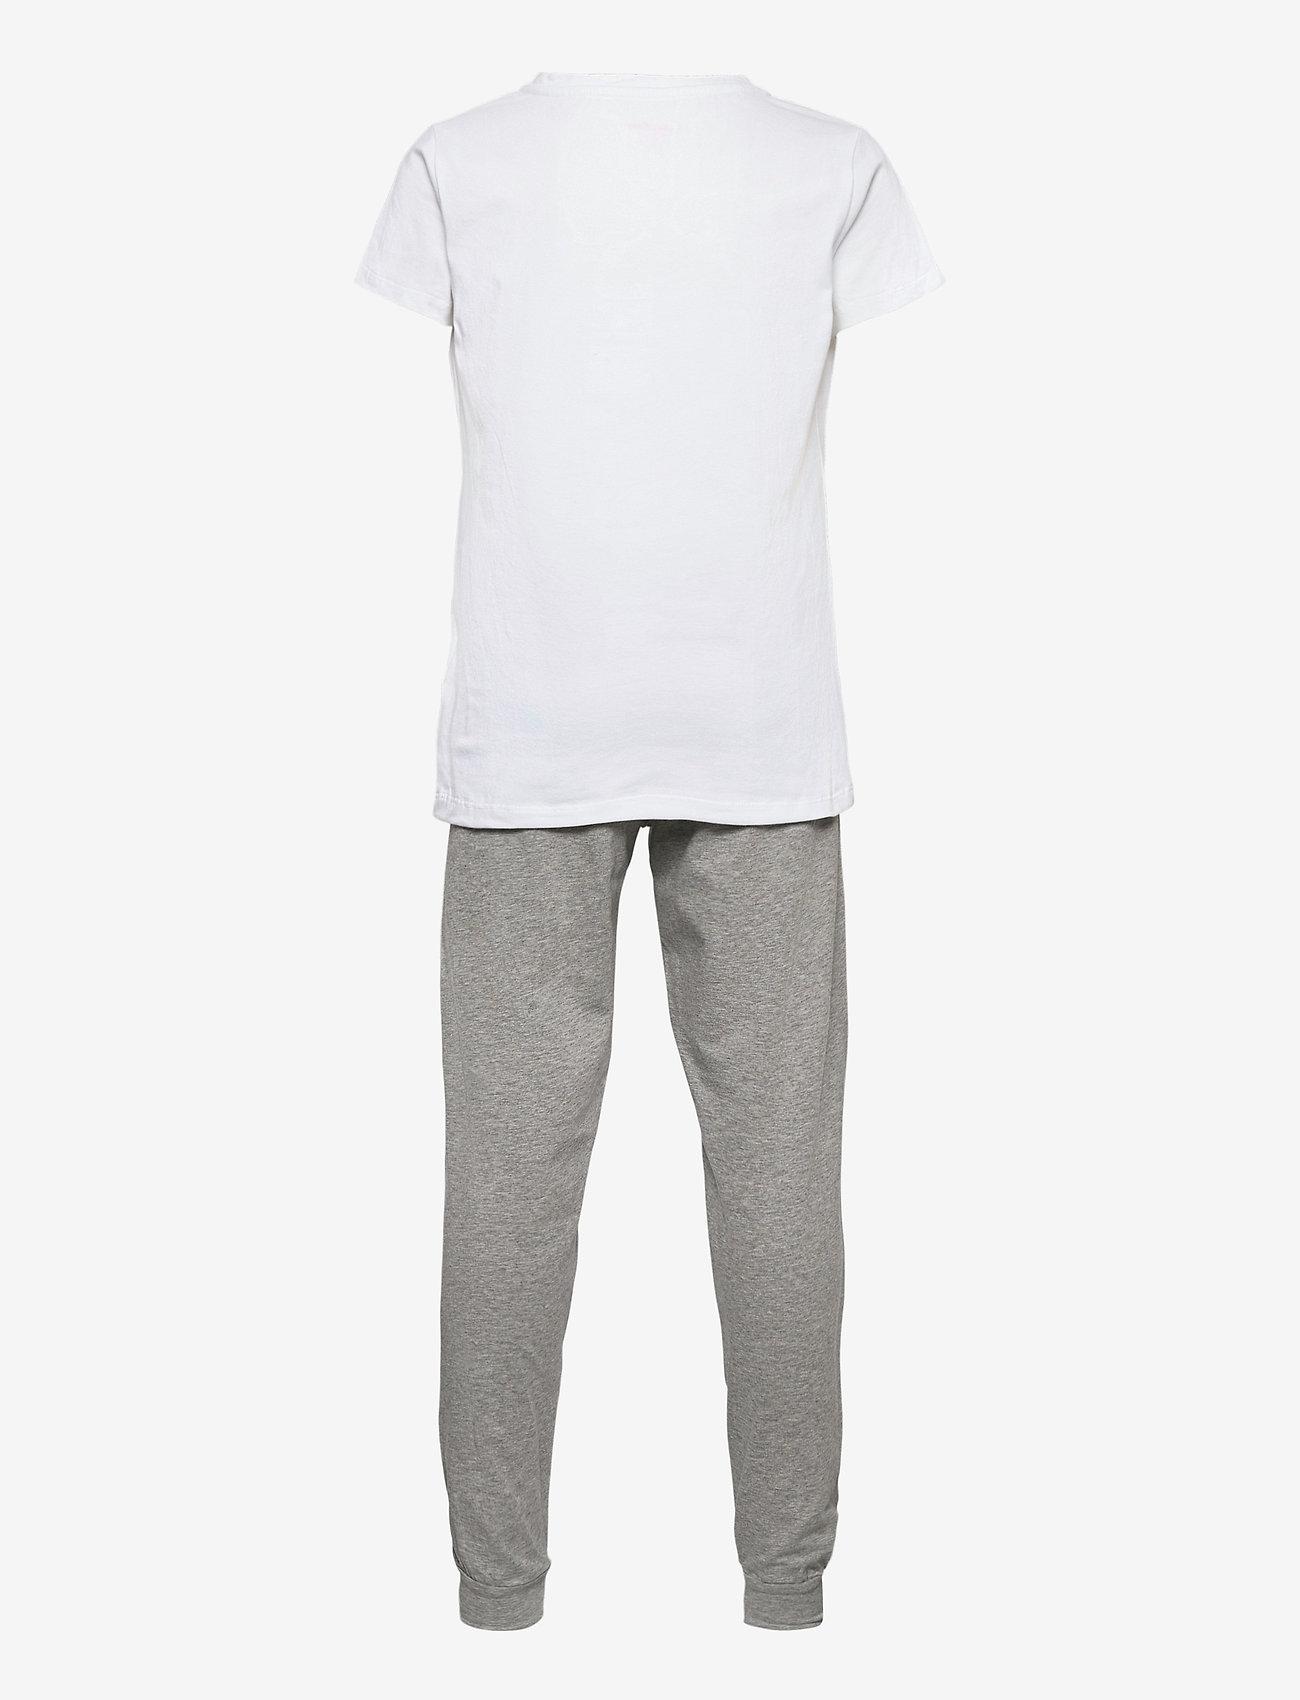 Calvin Klein - SS KNIT PJ SET - ondergoedsets - white/grey htr - 1